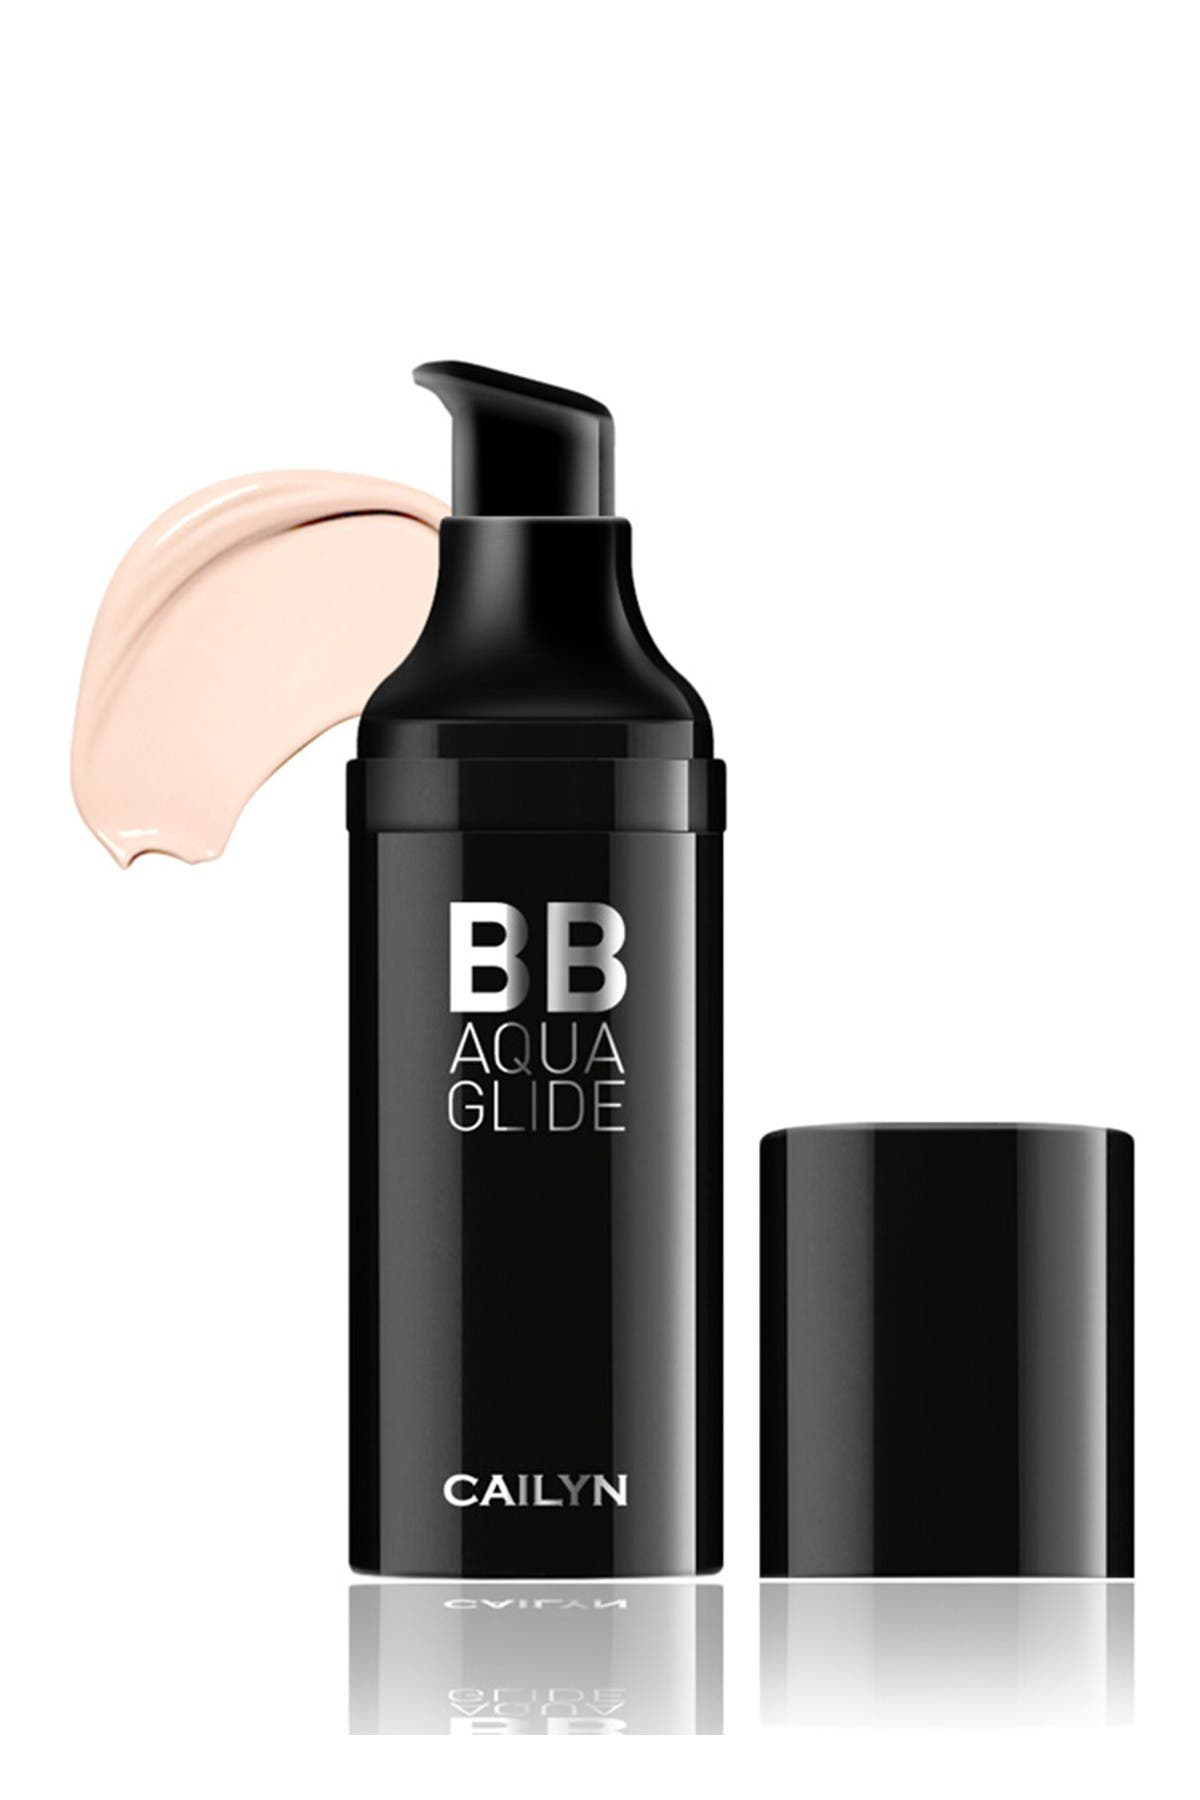 Cailyn Cosmetics Bb Aqua Glide 3-in-1 Moisturizer In Porcelain